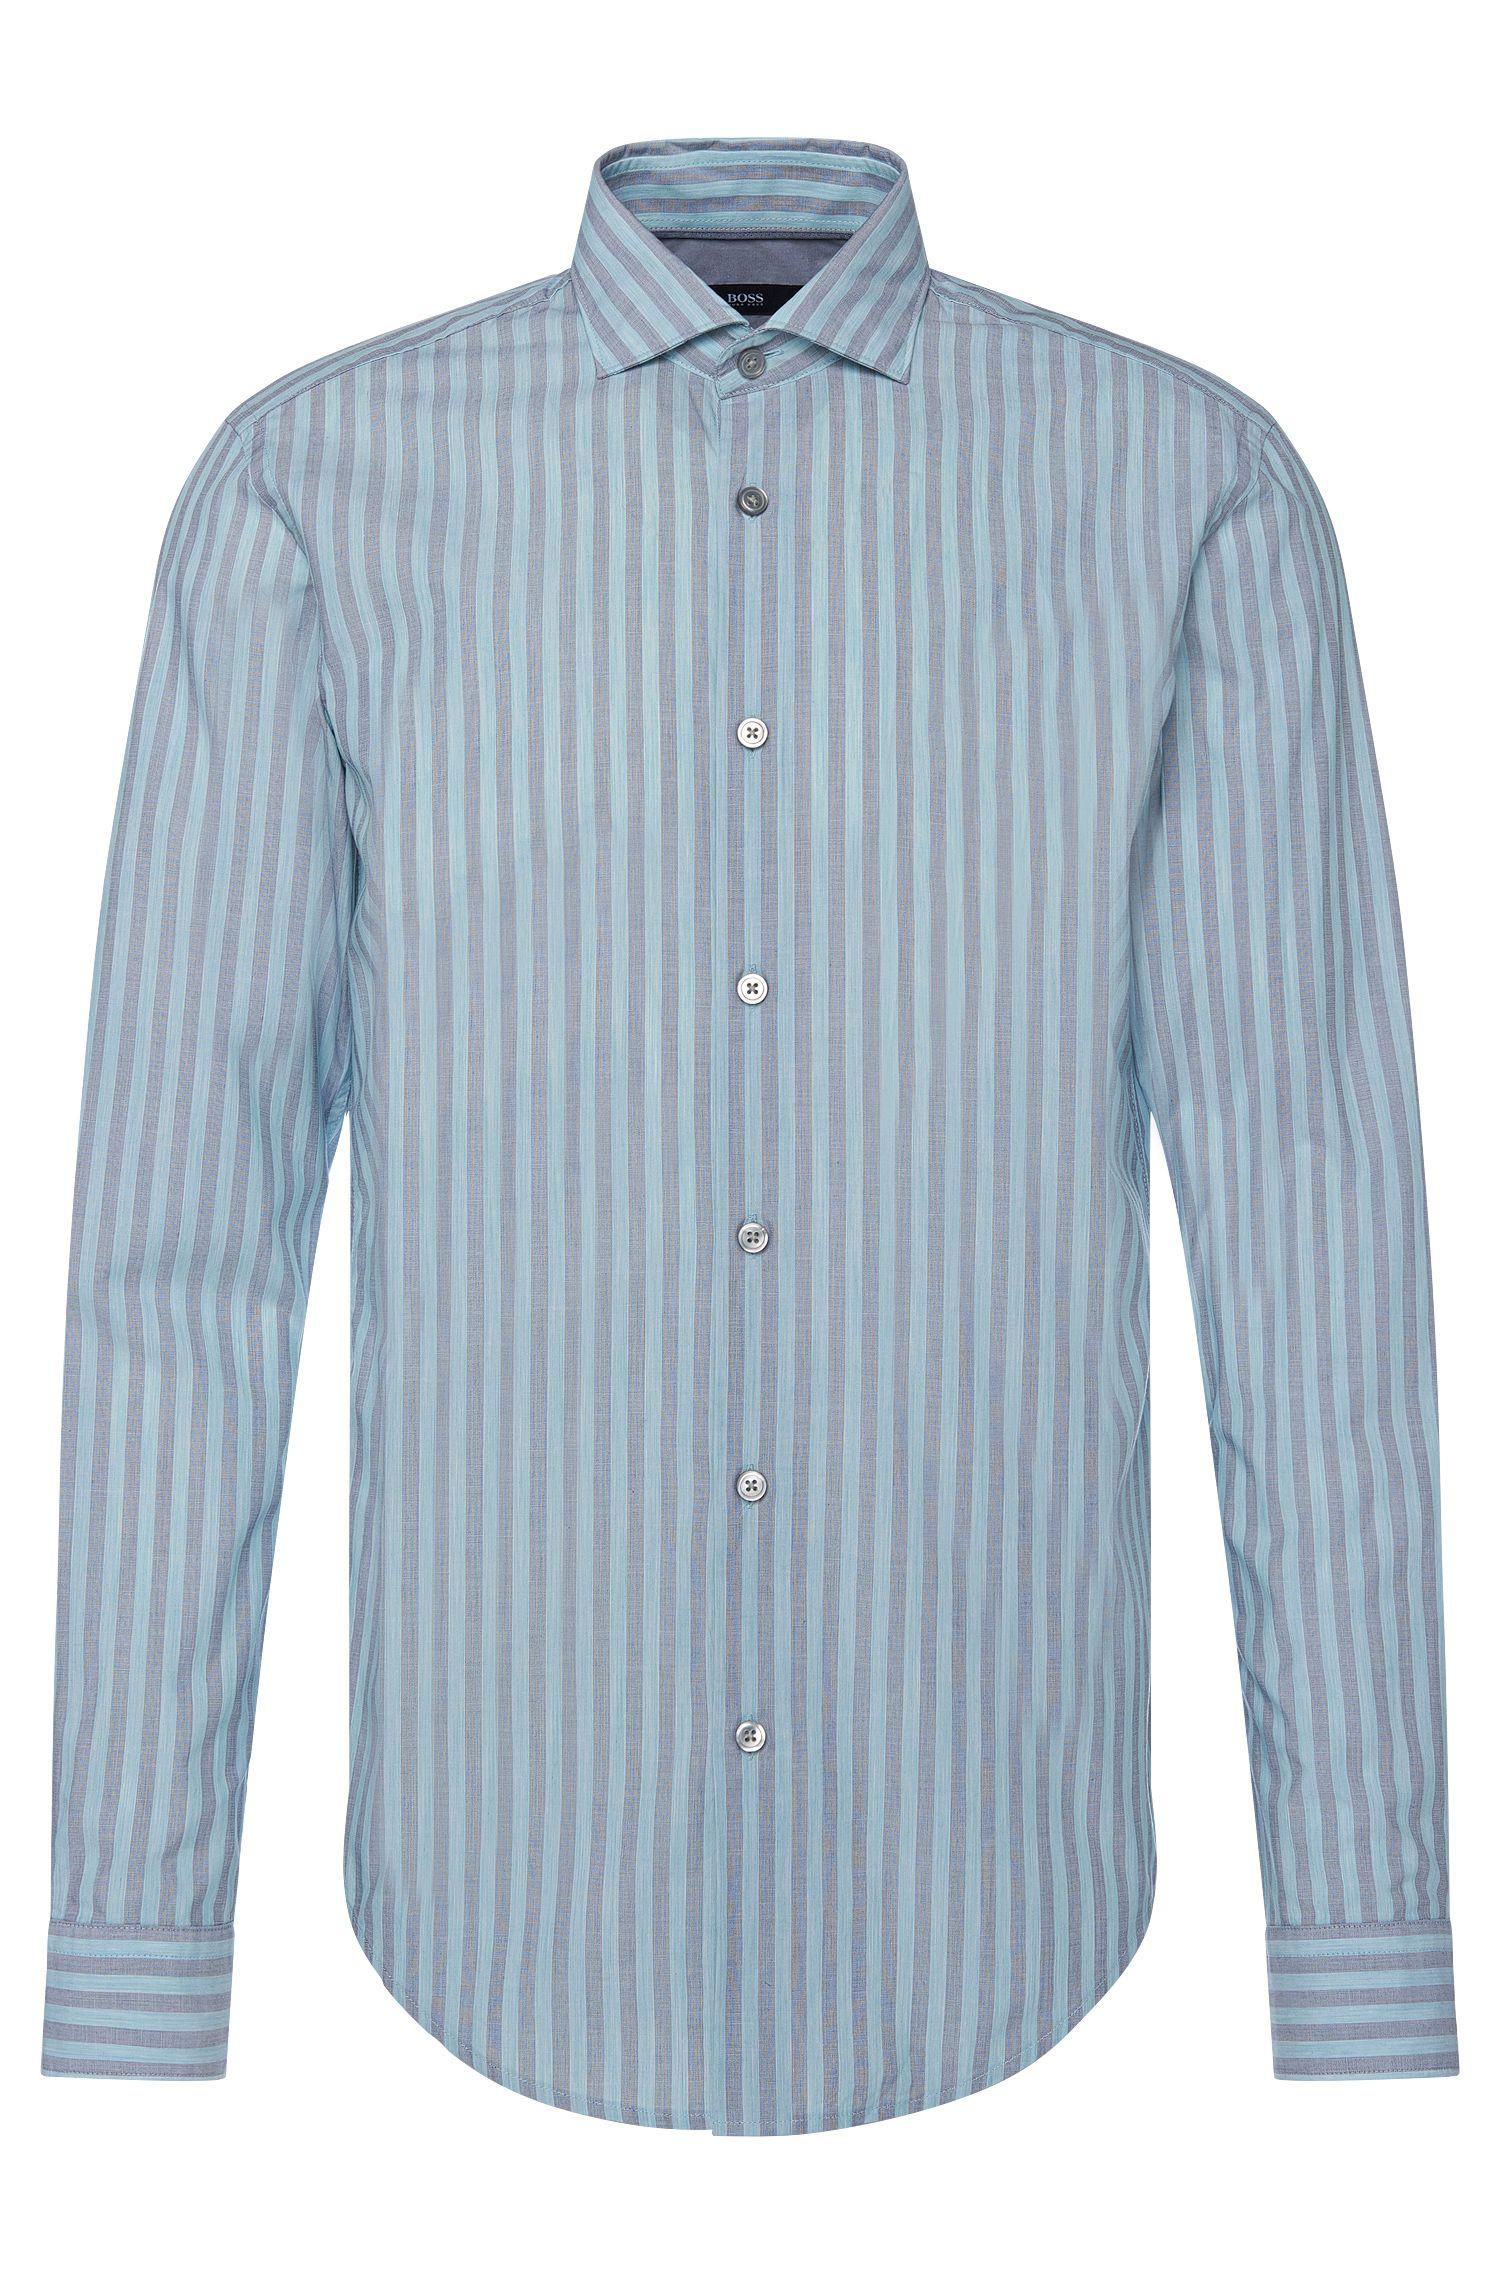 Cotton Striped Button Down Shirt, Slim Fit | Ridley